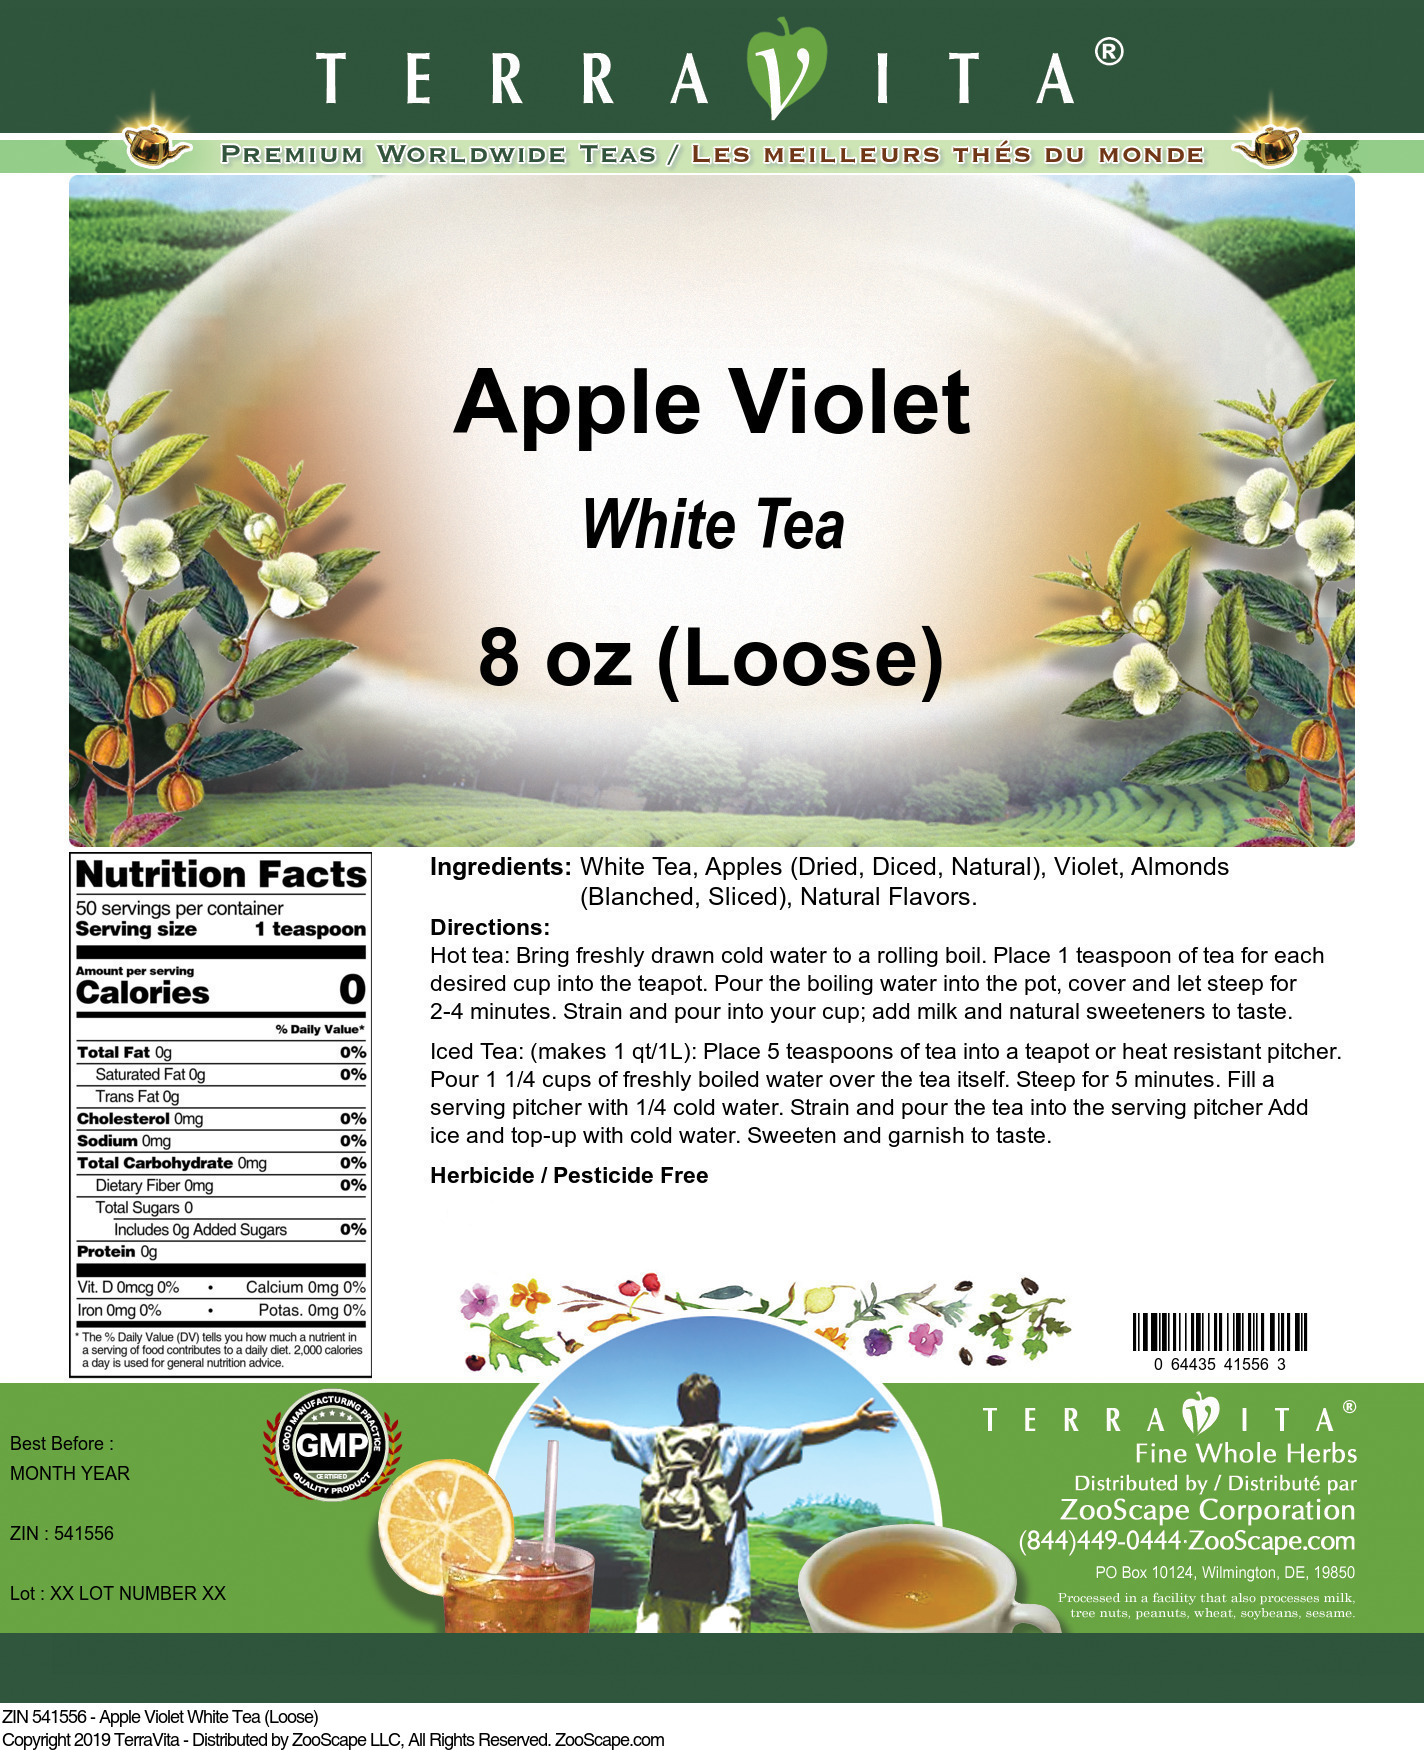 Apple Violet White Tea